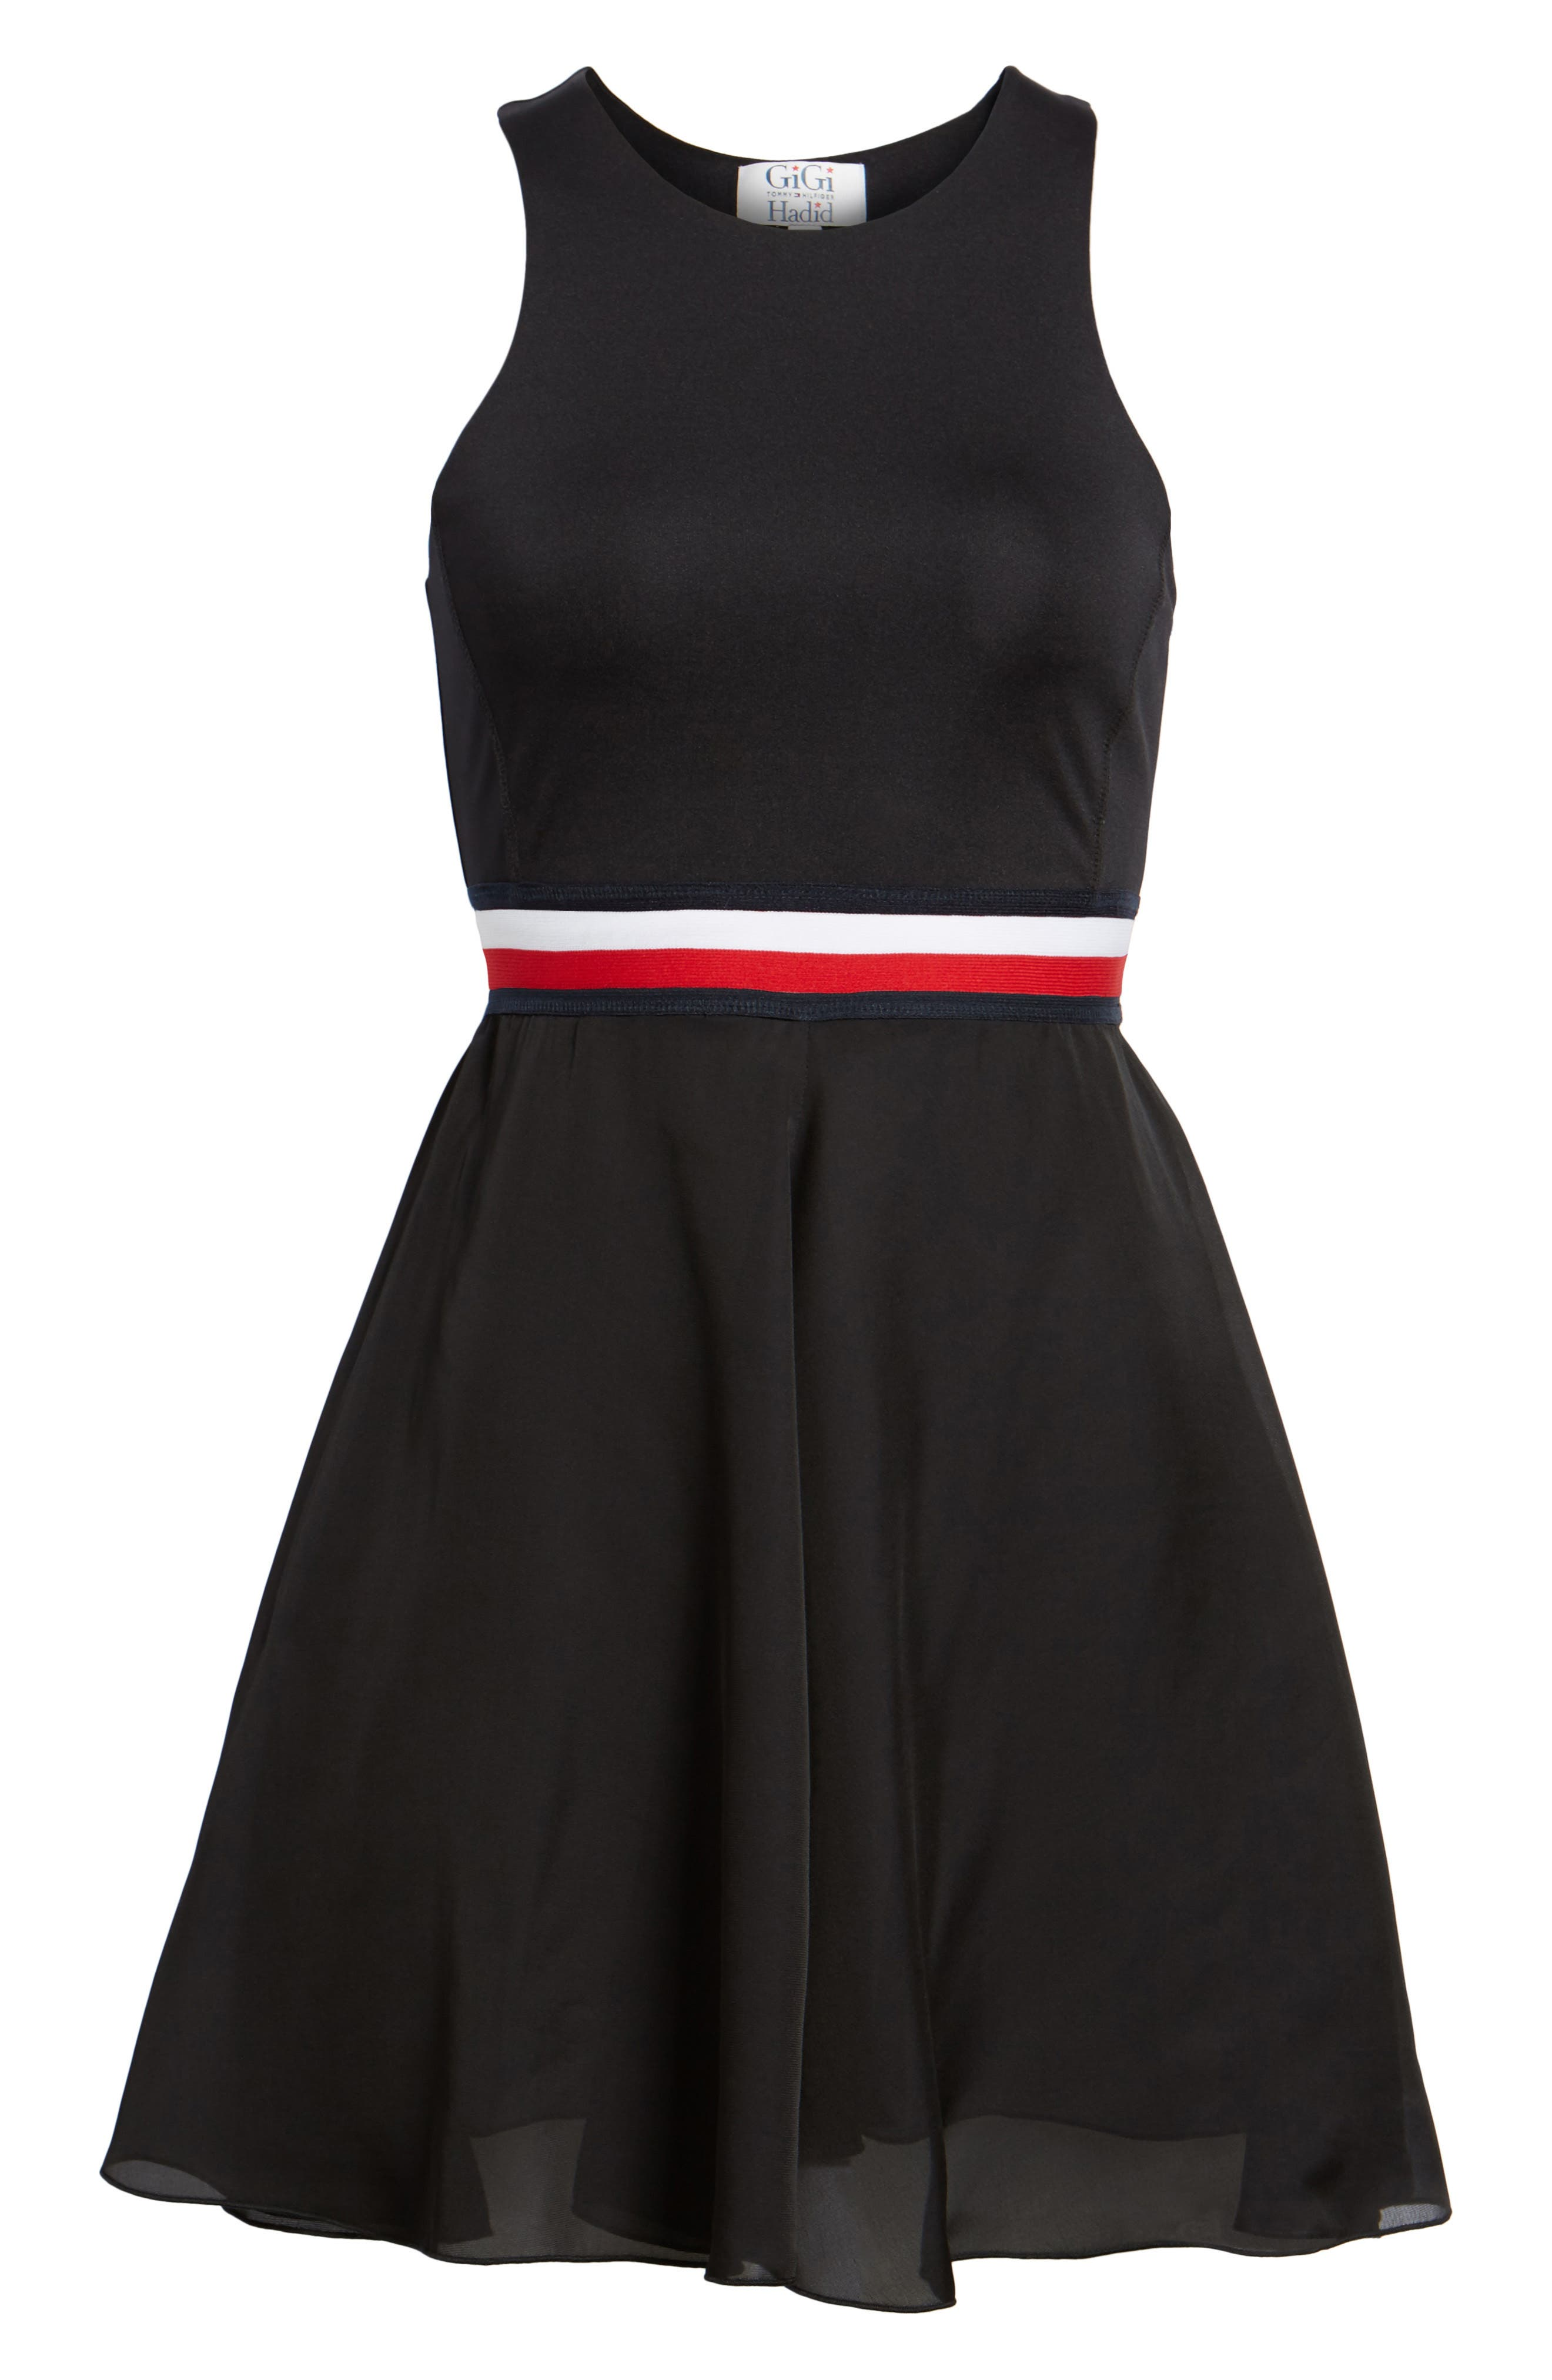 x Gigi Hadid Racerback Dress,                             Alternate thumbnail 7, color,                             001